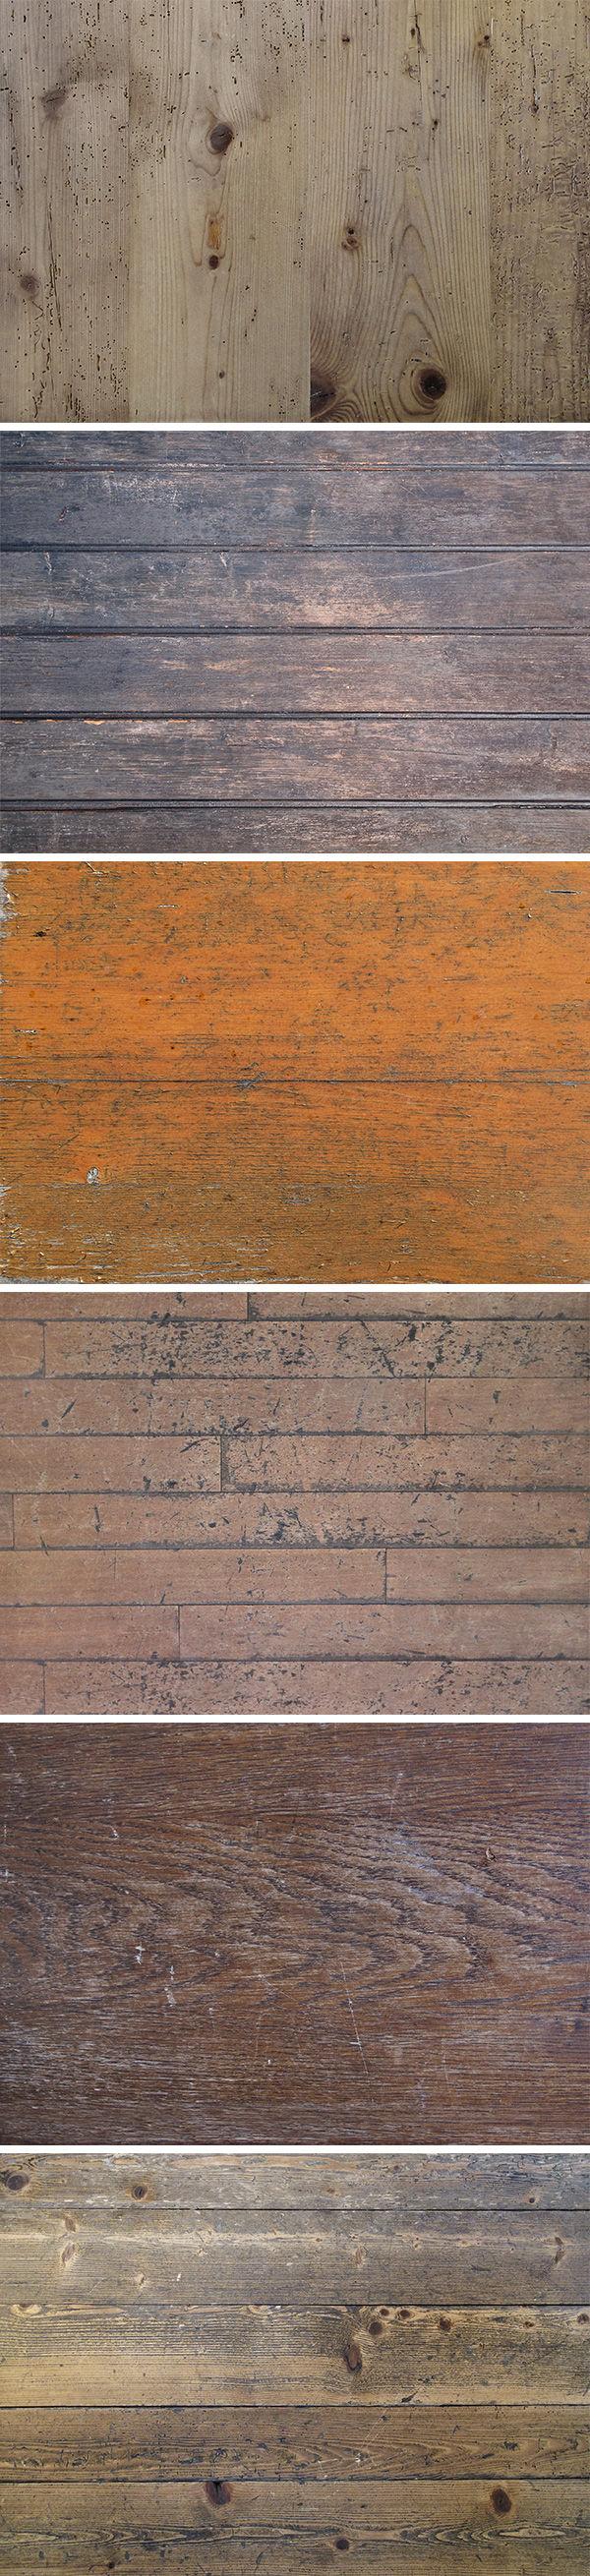 Vintage-Wood-Texture-Vol2-600